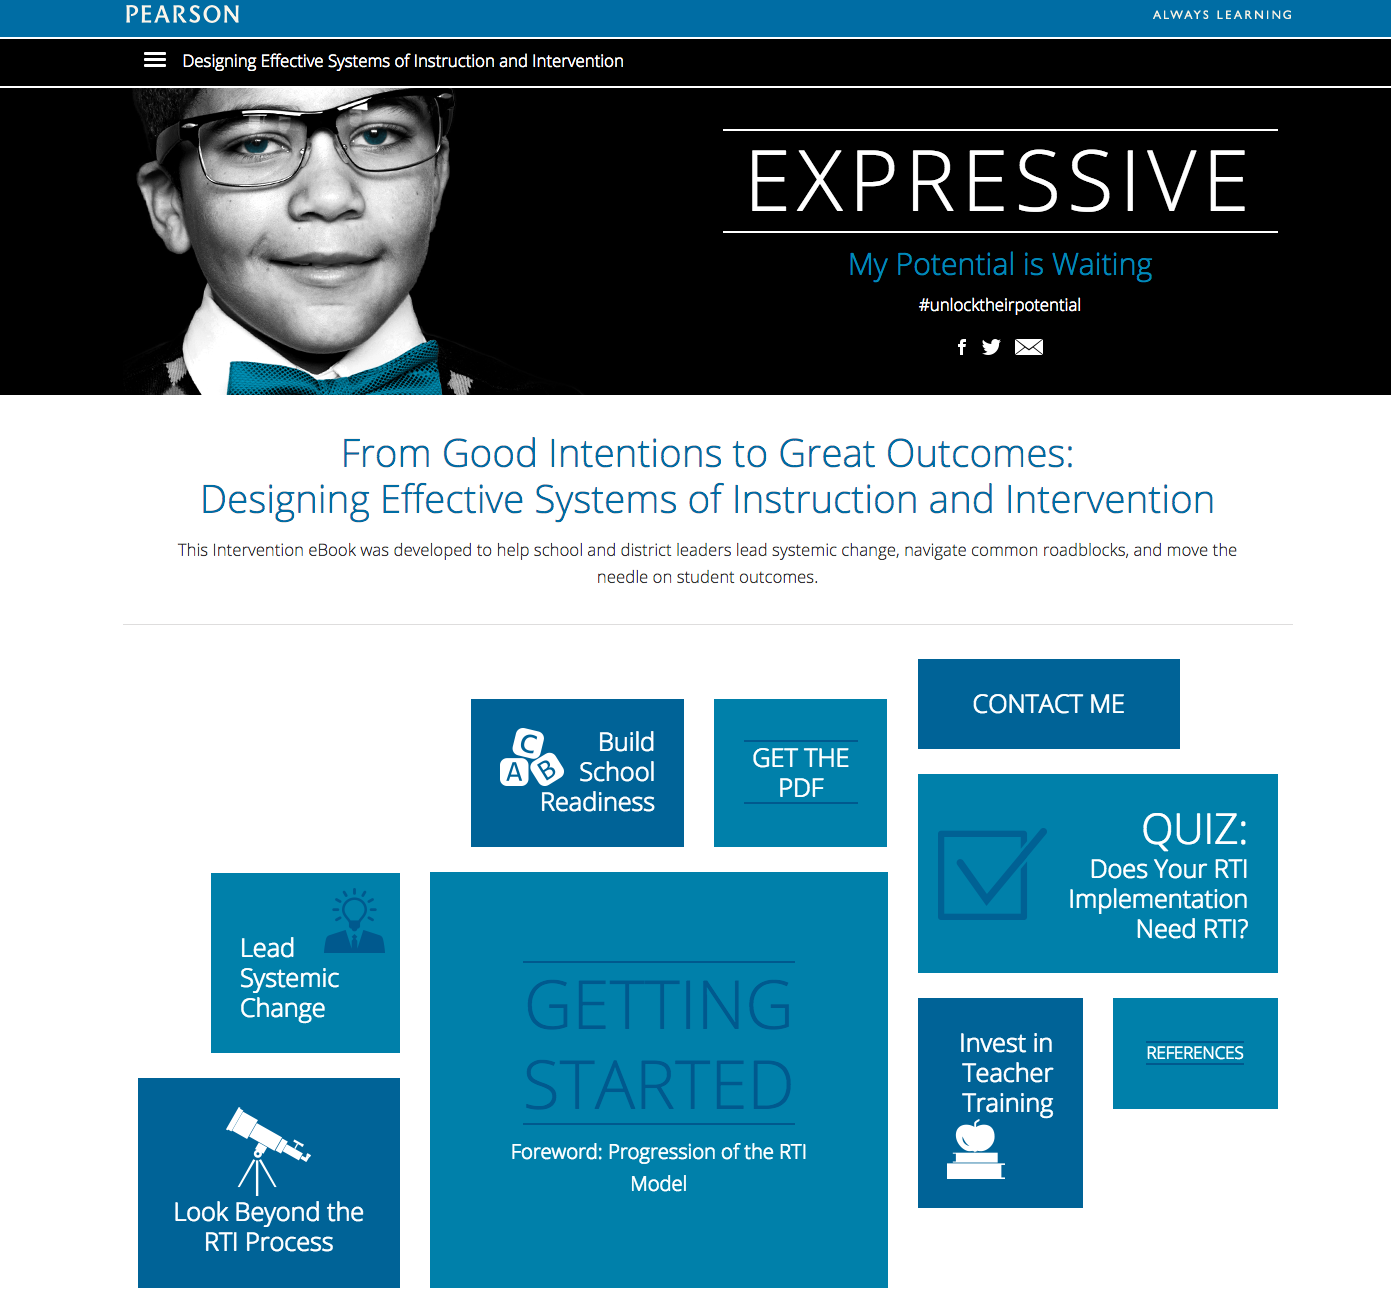 Pearson_eBook_interactive